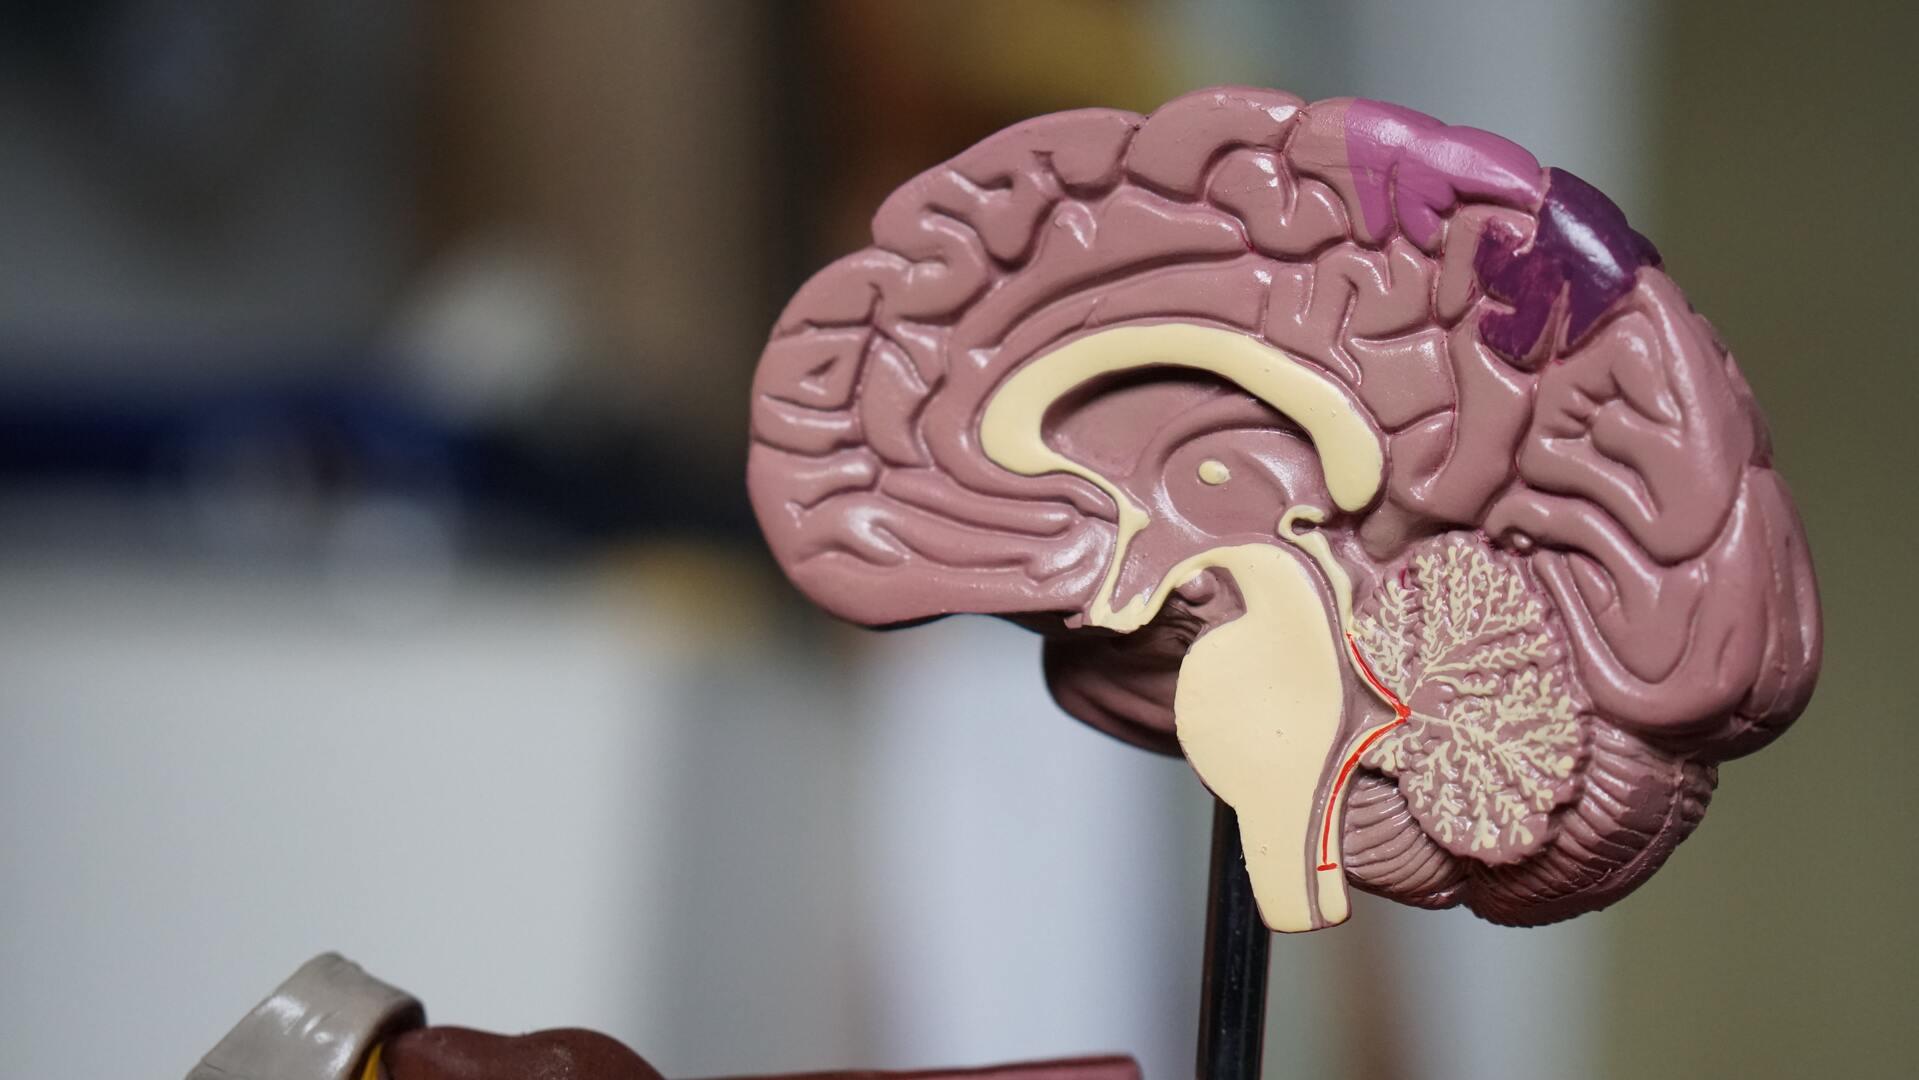 Мозг и любопытство, мозг и новизна